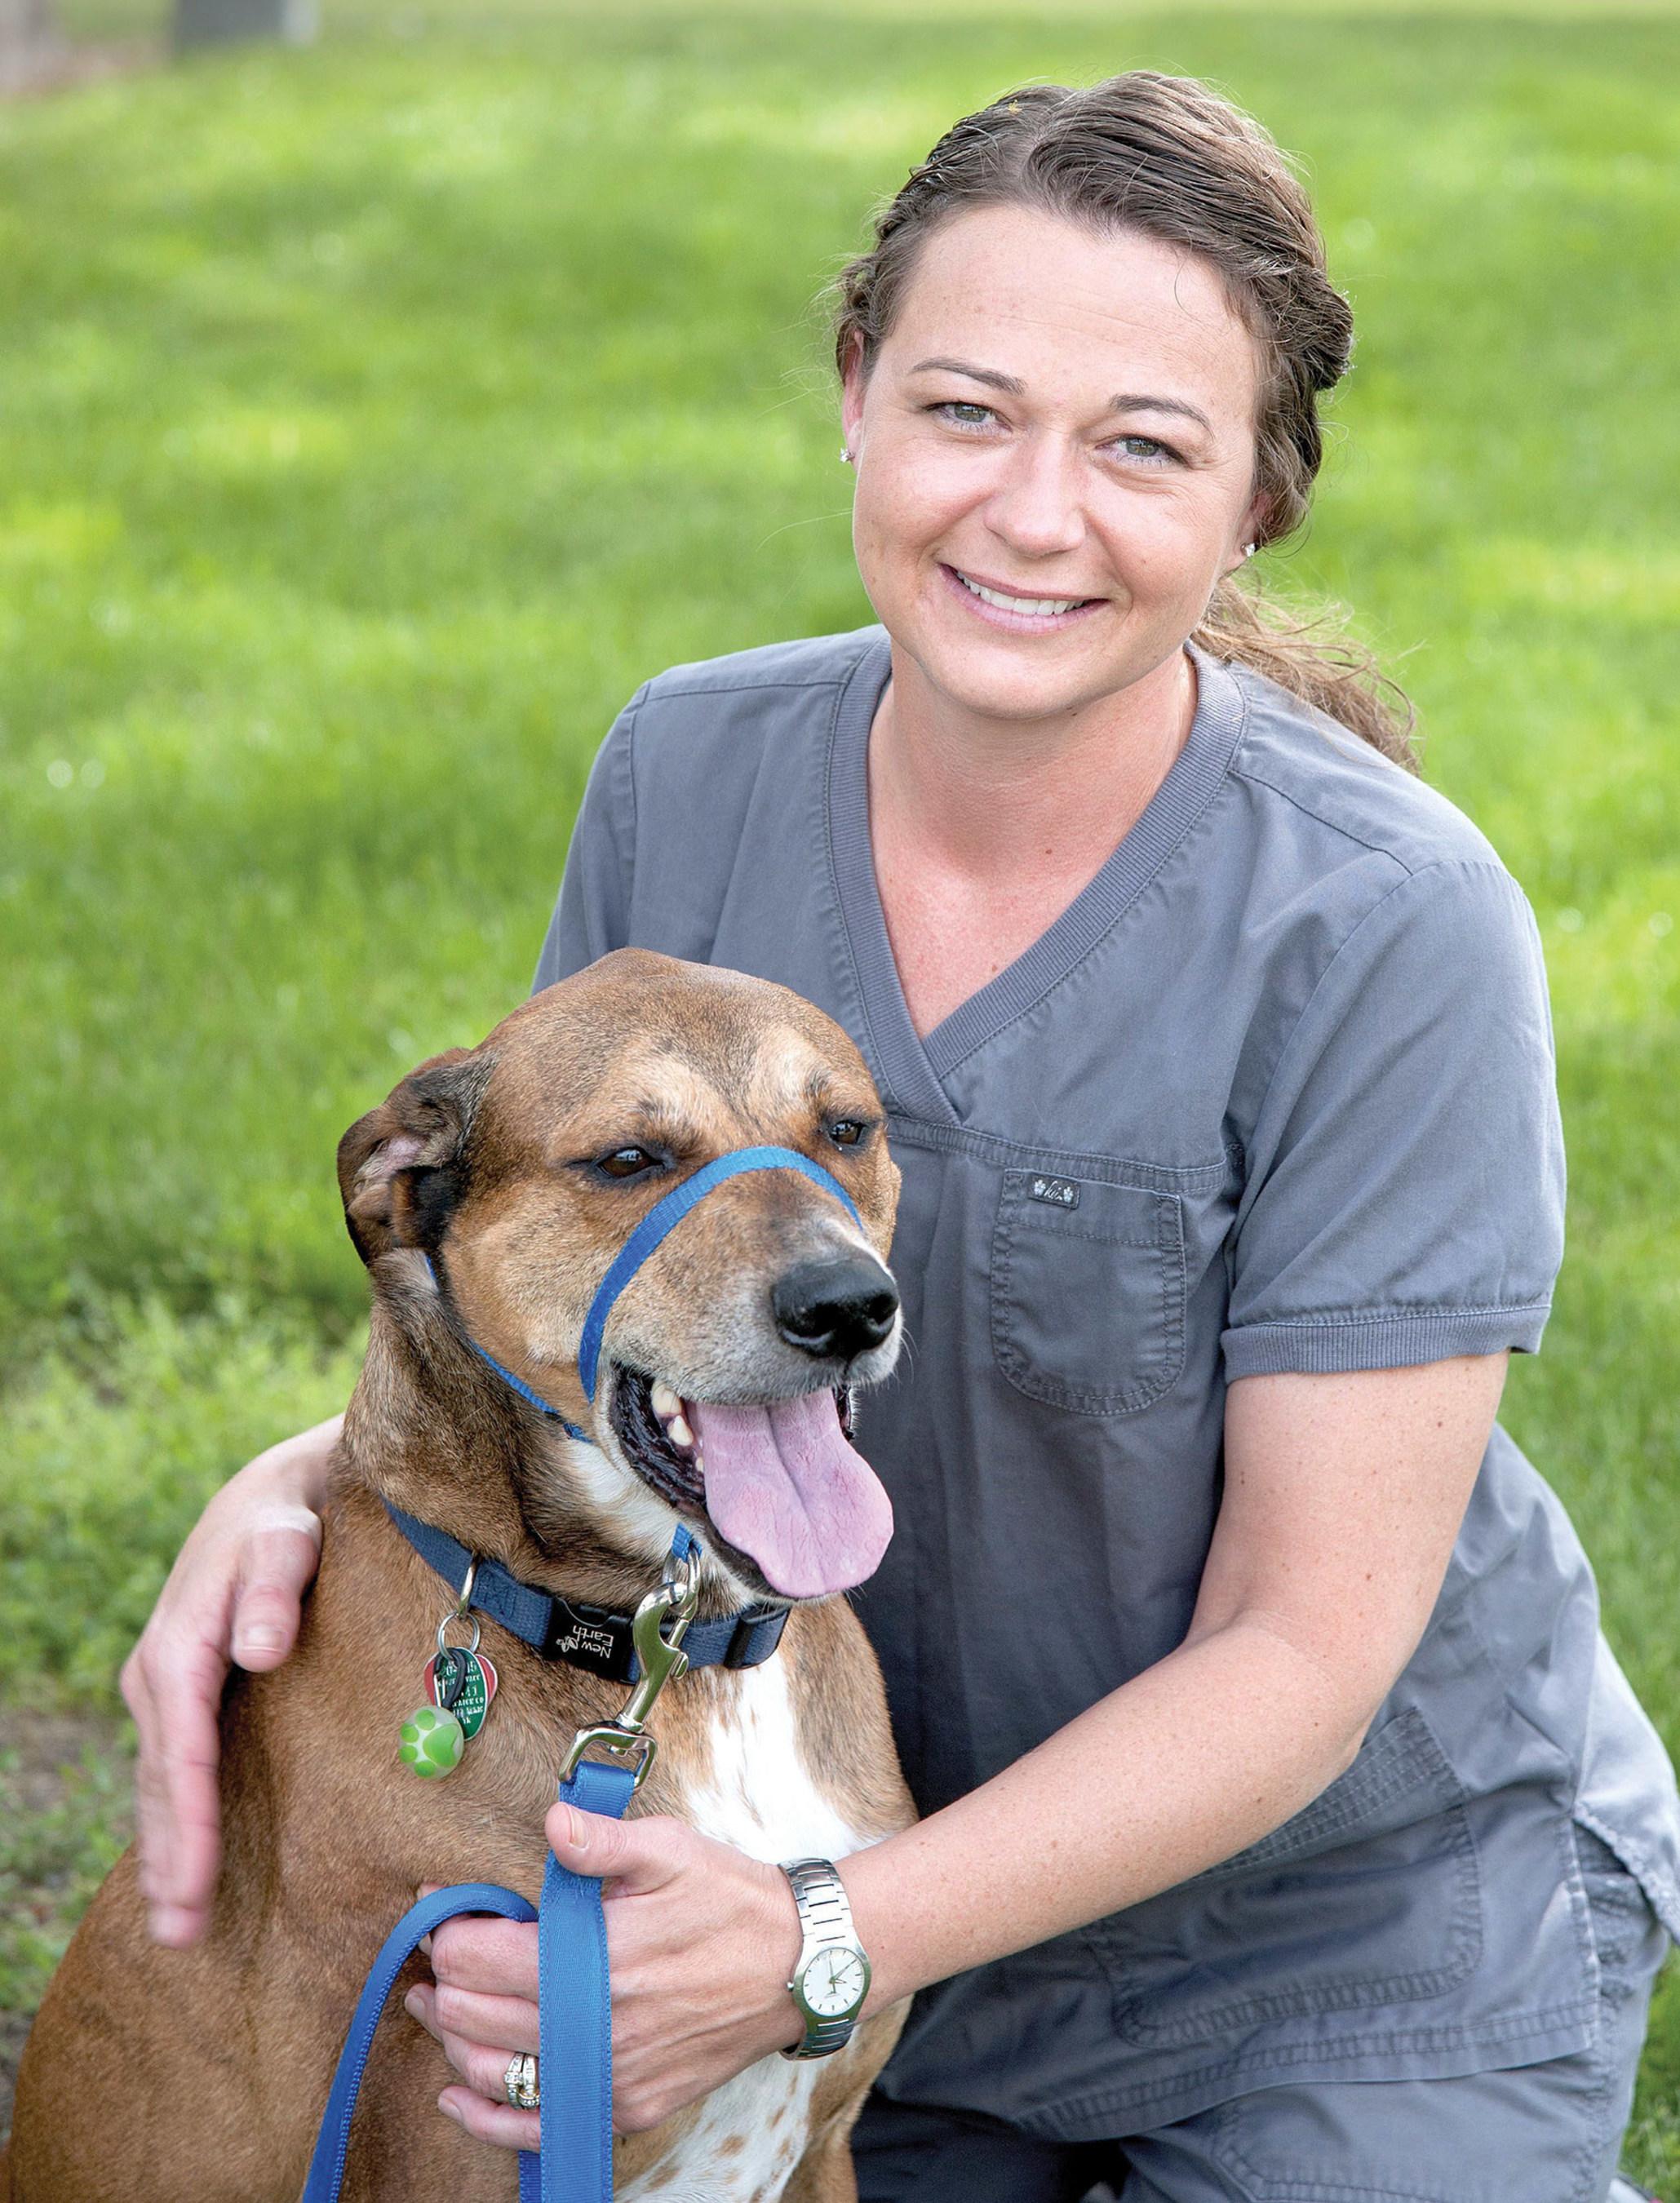 Kim Knap of Urbana, Illinois was named the American Humane Hero Veterinary Technician for 2016.